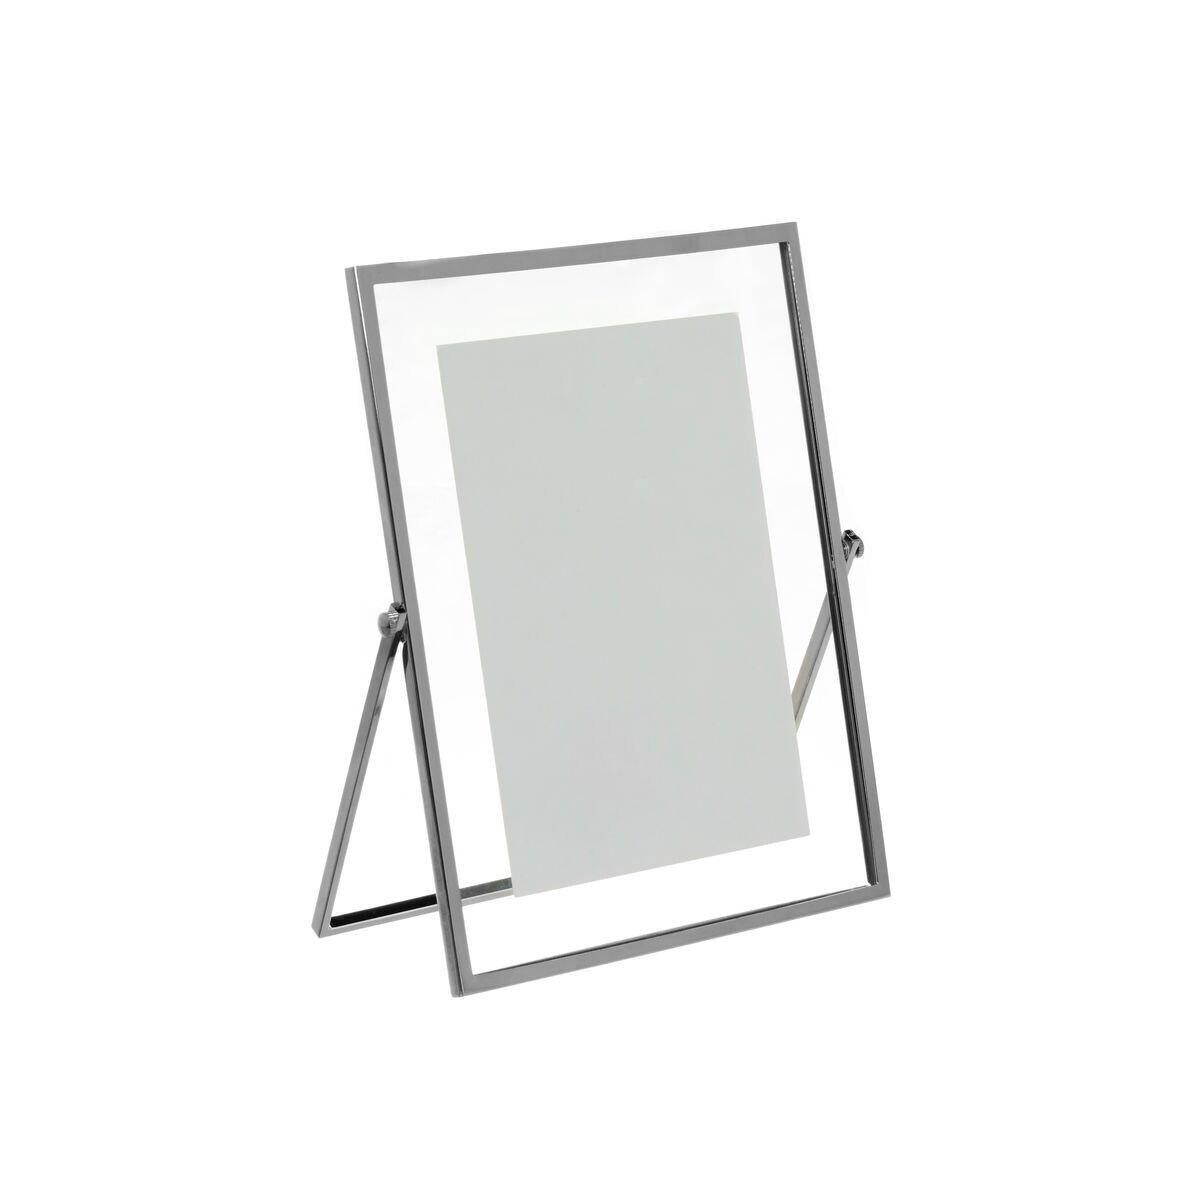 Portafoto a cavalletto in metallo silver plated, Grigio argento, large image number 0